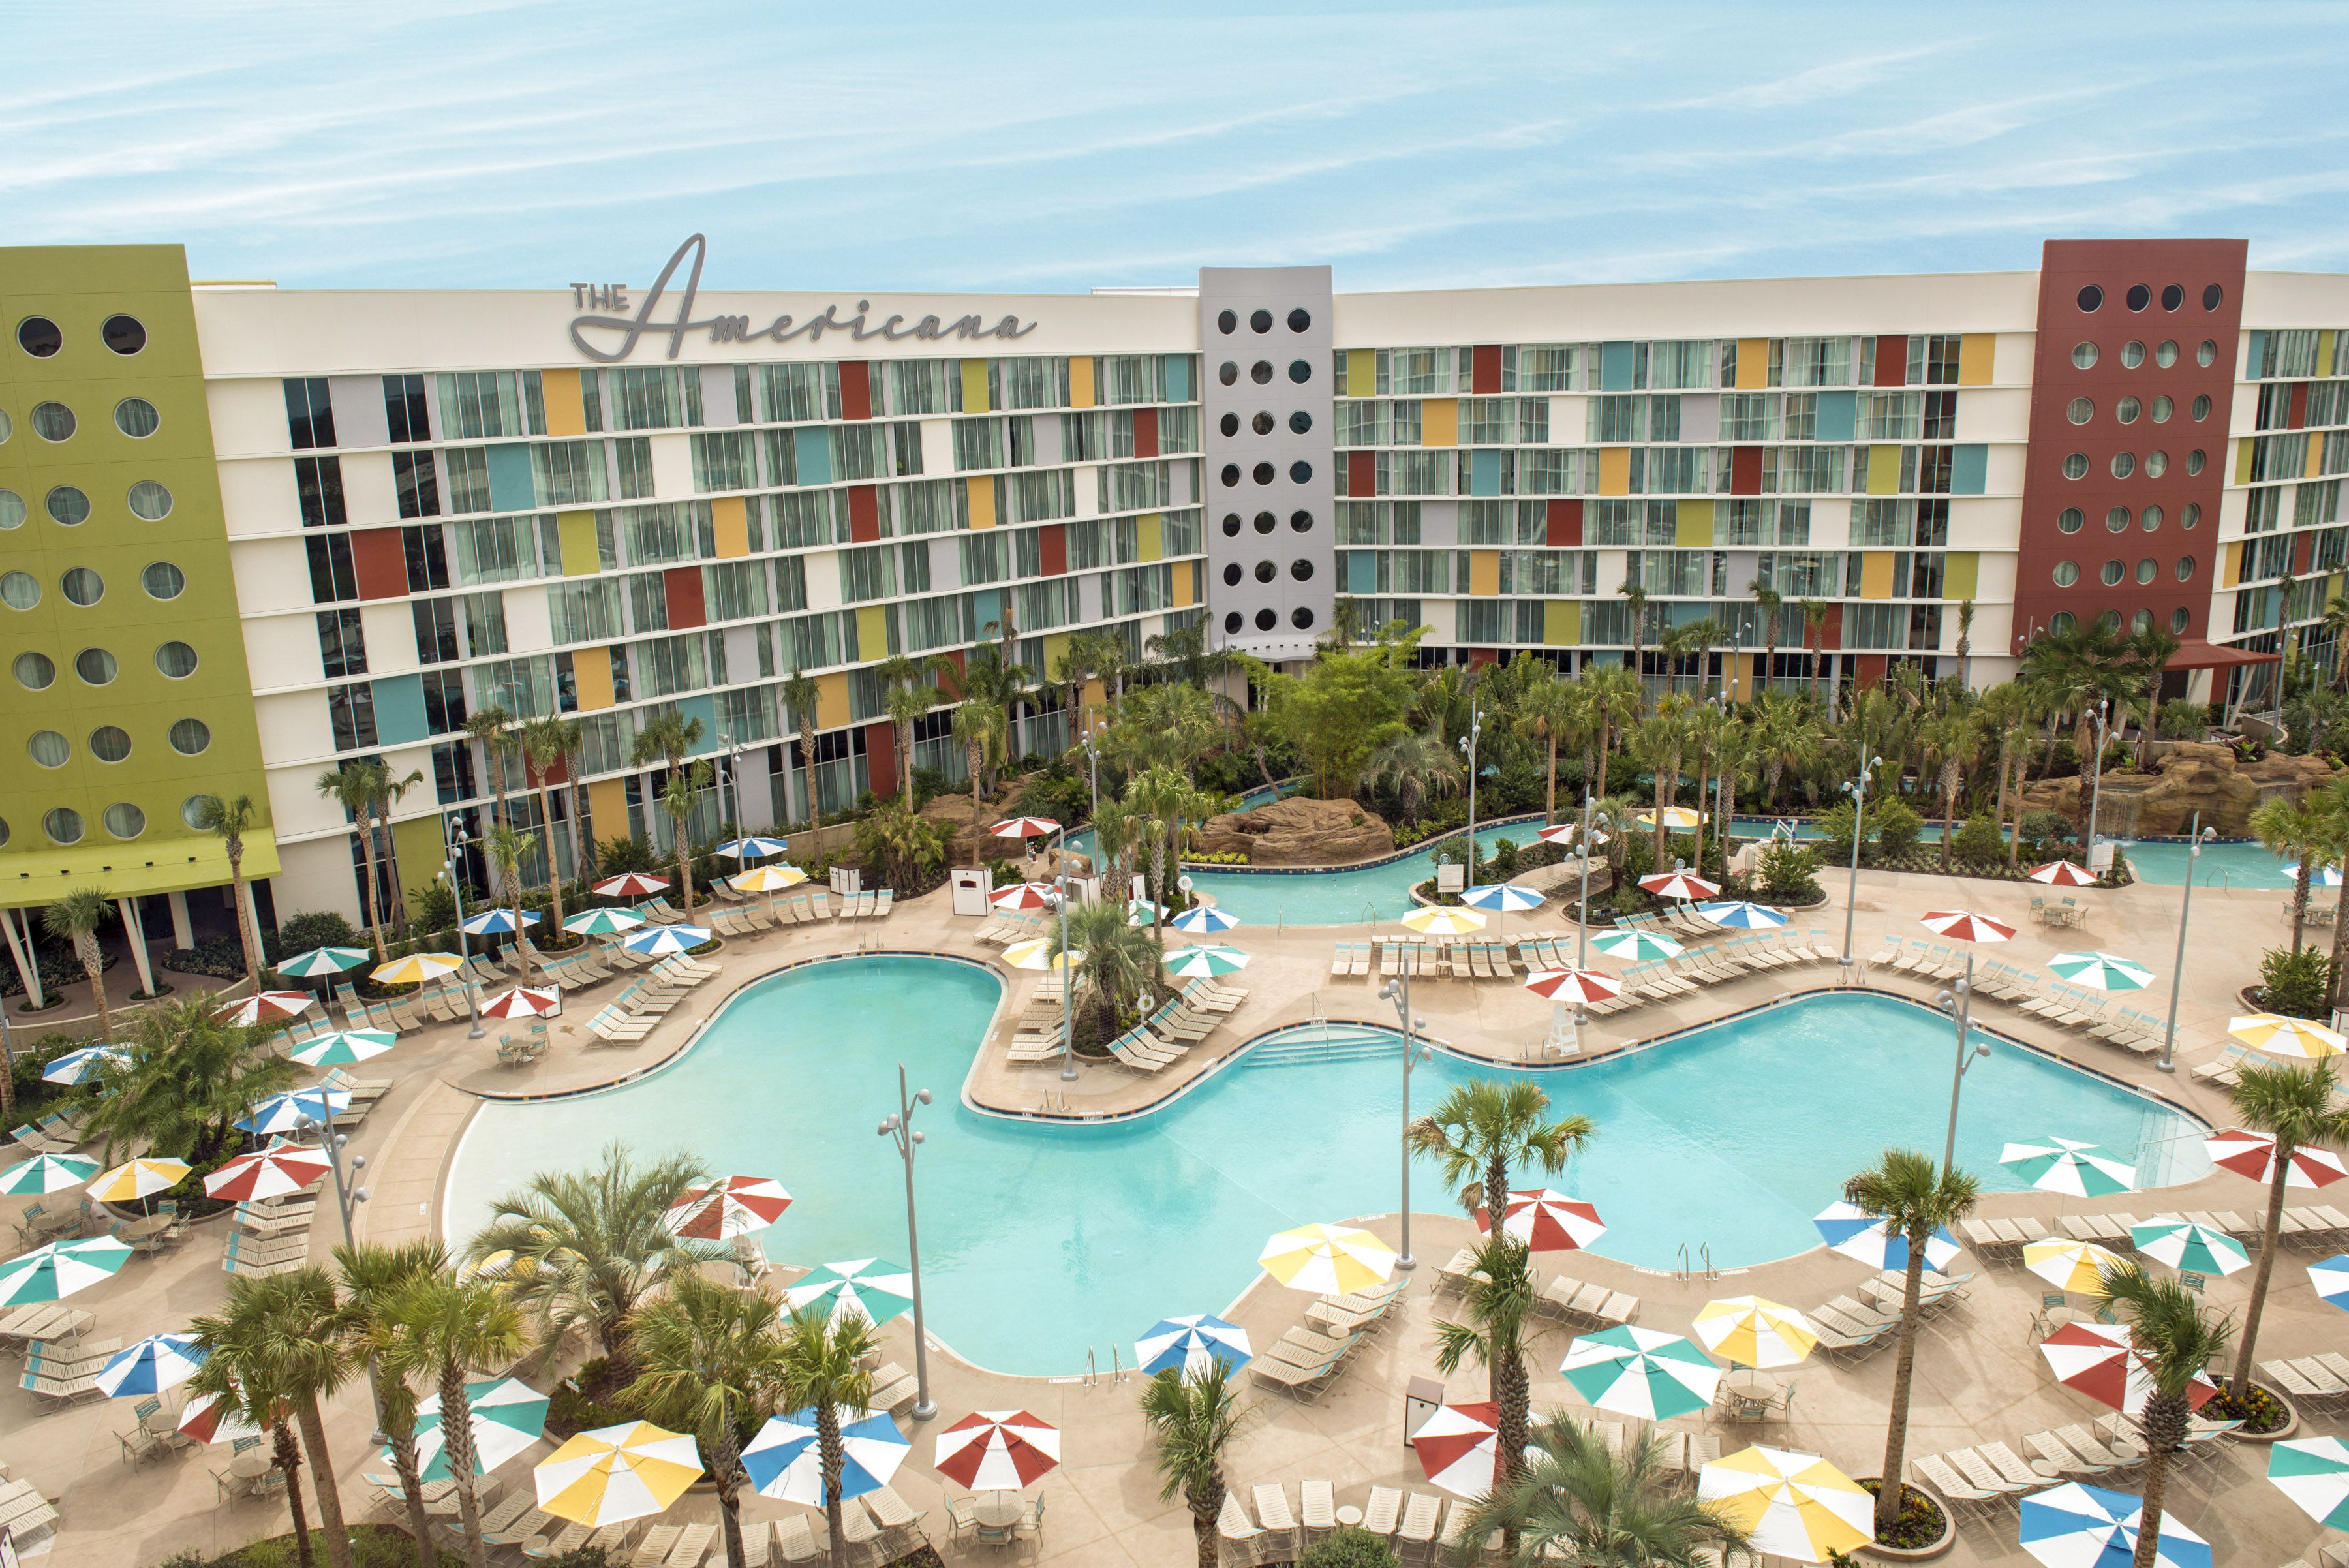 Universal's Cabana Bay Orlando